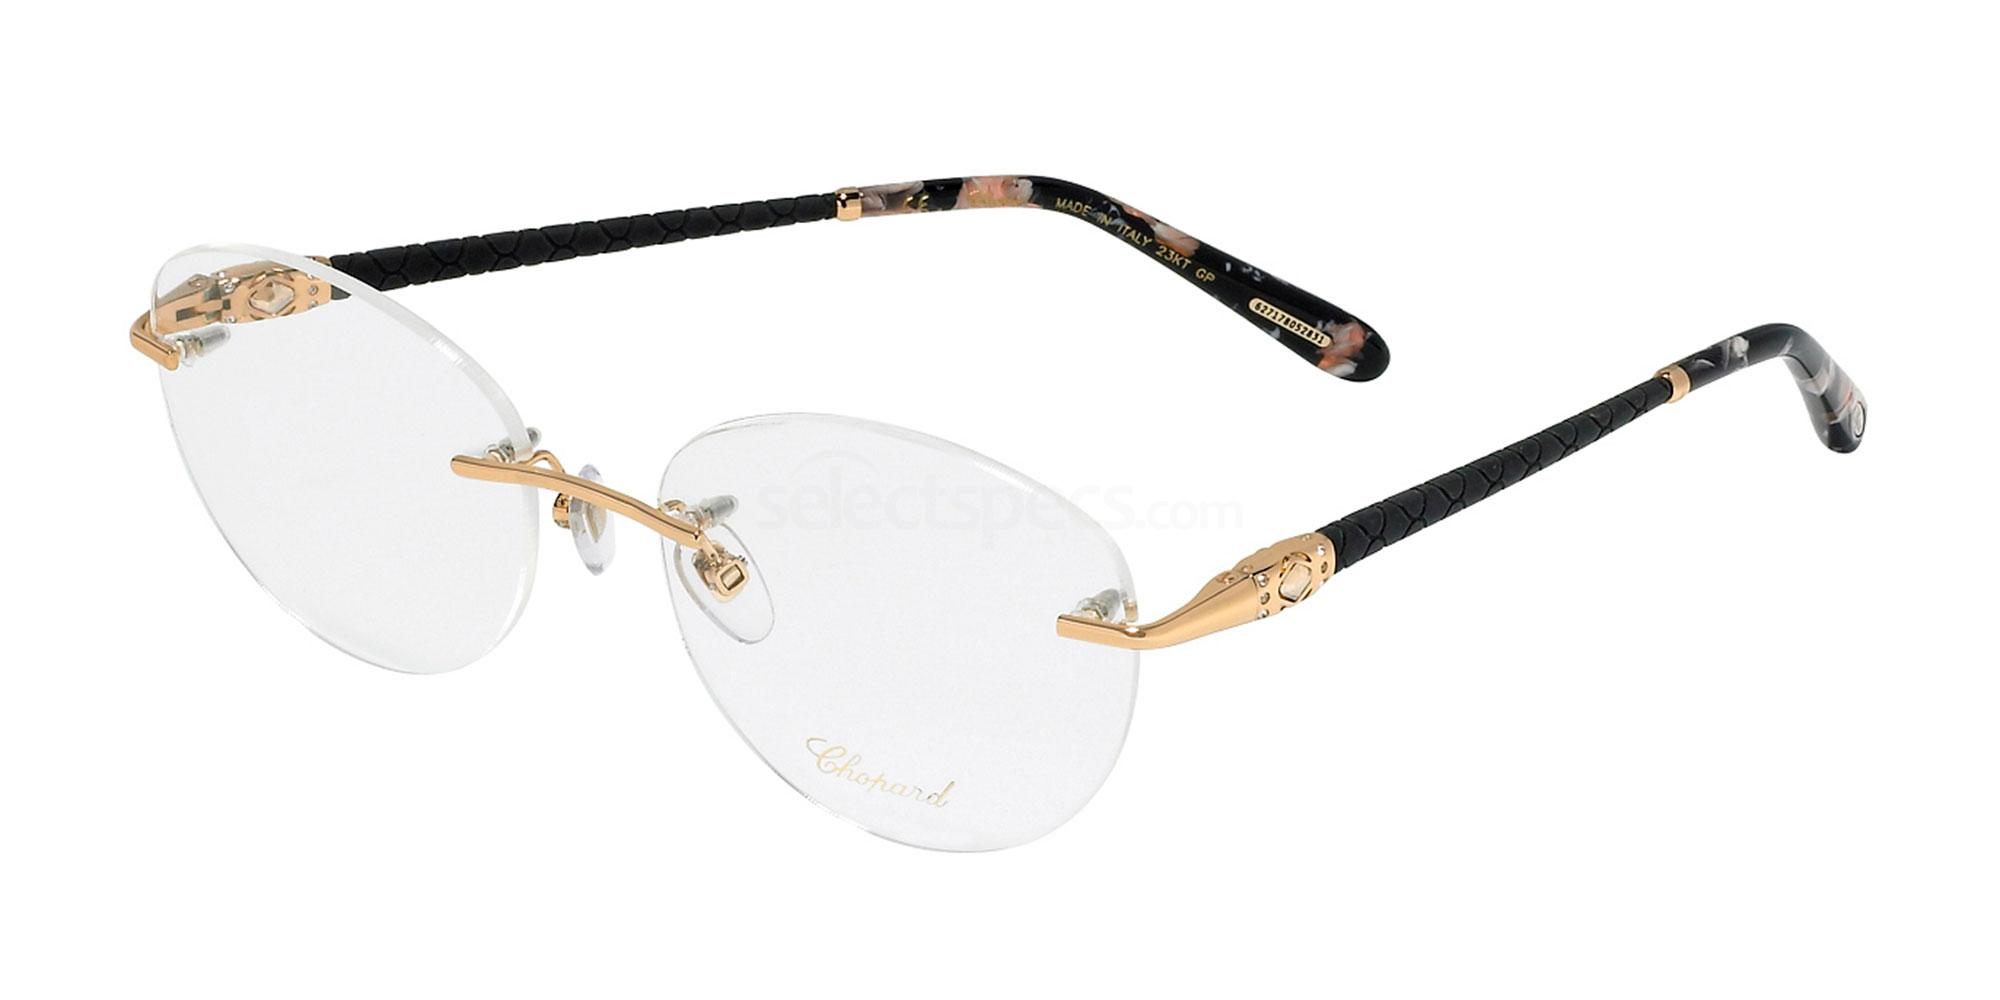 0300 VCHC71S Glasses, Chopard